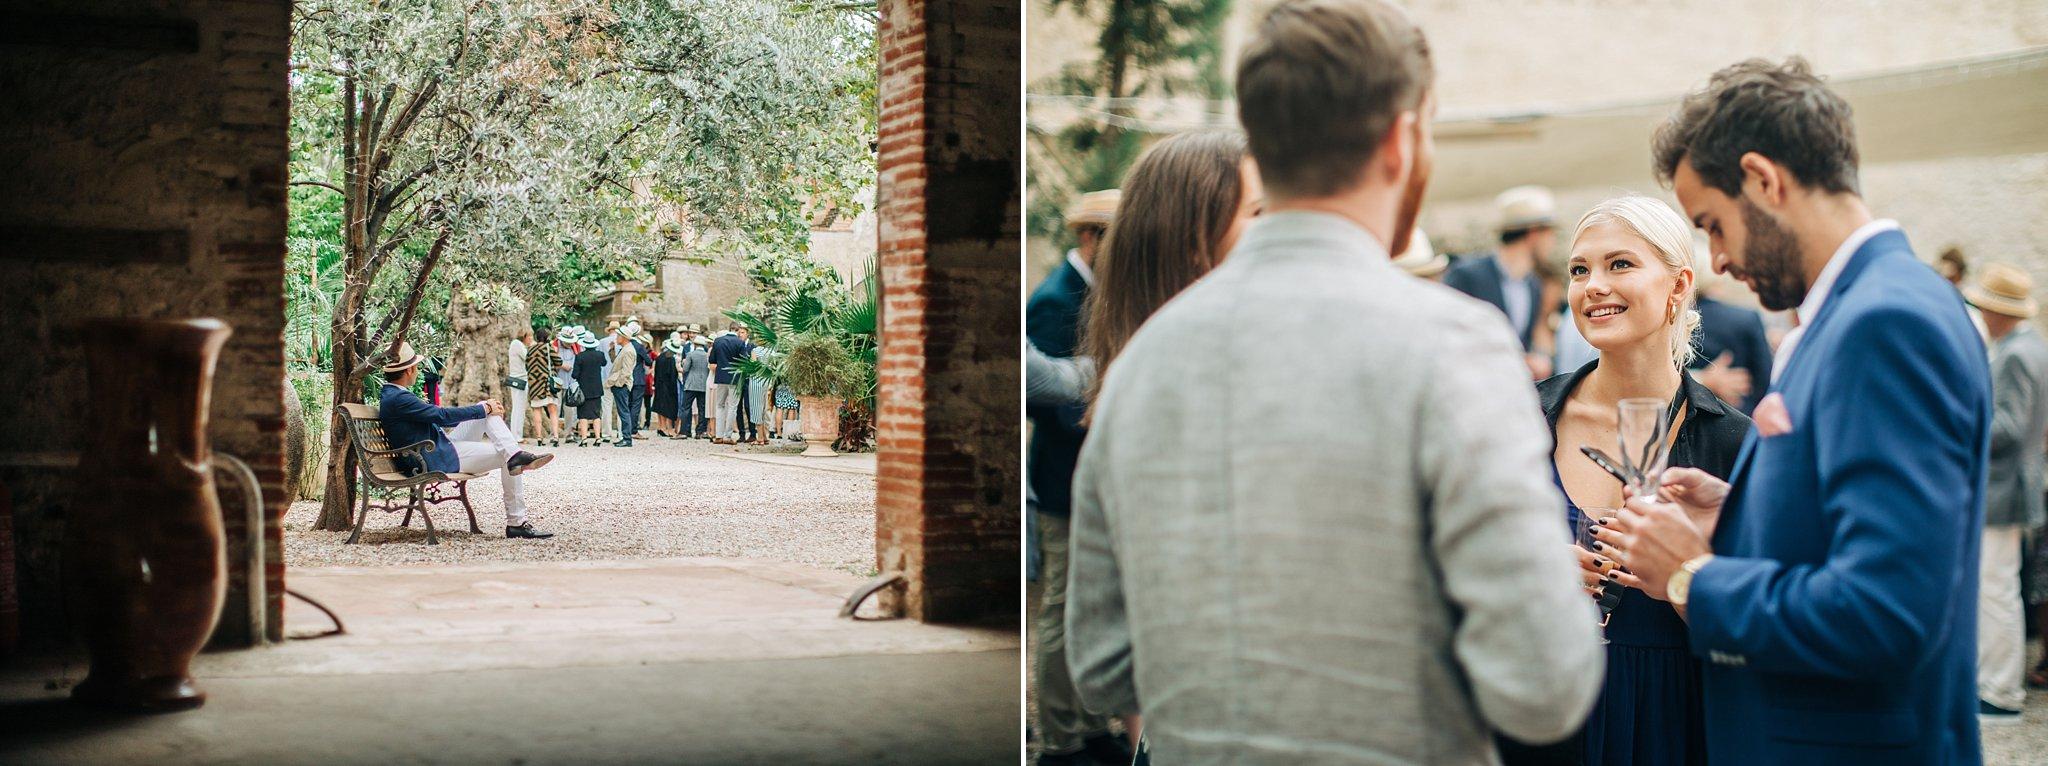 Wedding Photographer Perpignan - Château Las Collas Wedding - Hugo Hennequin057.jpg